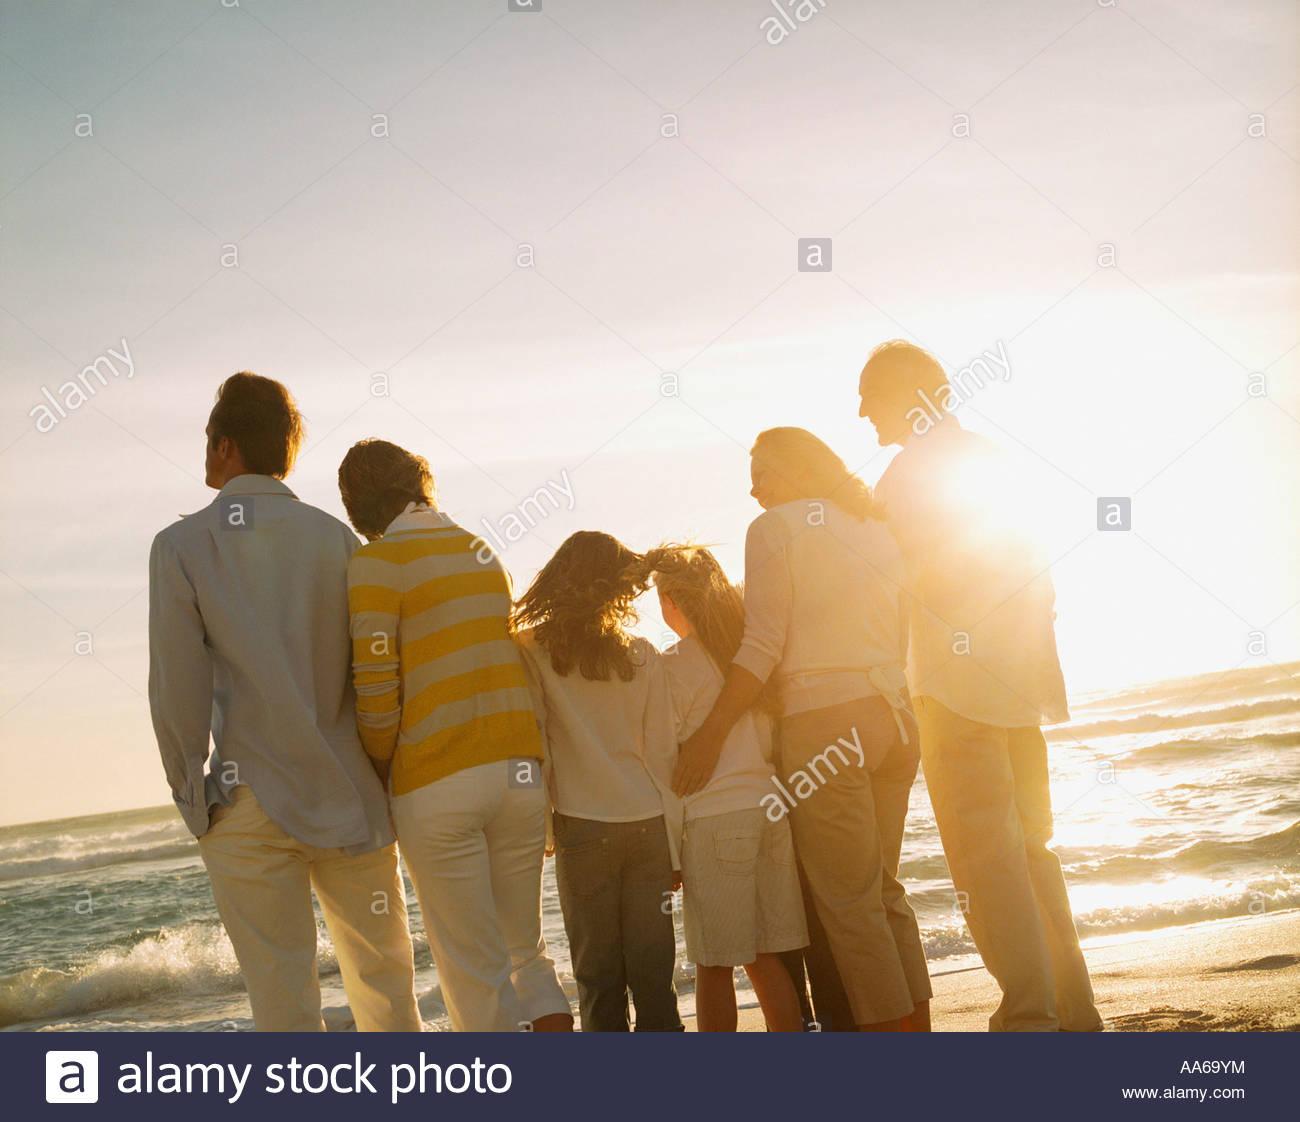 Multigenerational family portrait outdoors at sunset - Stock Image